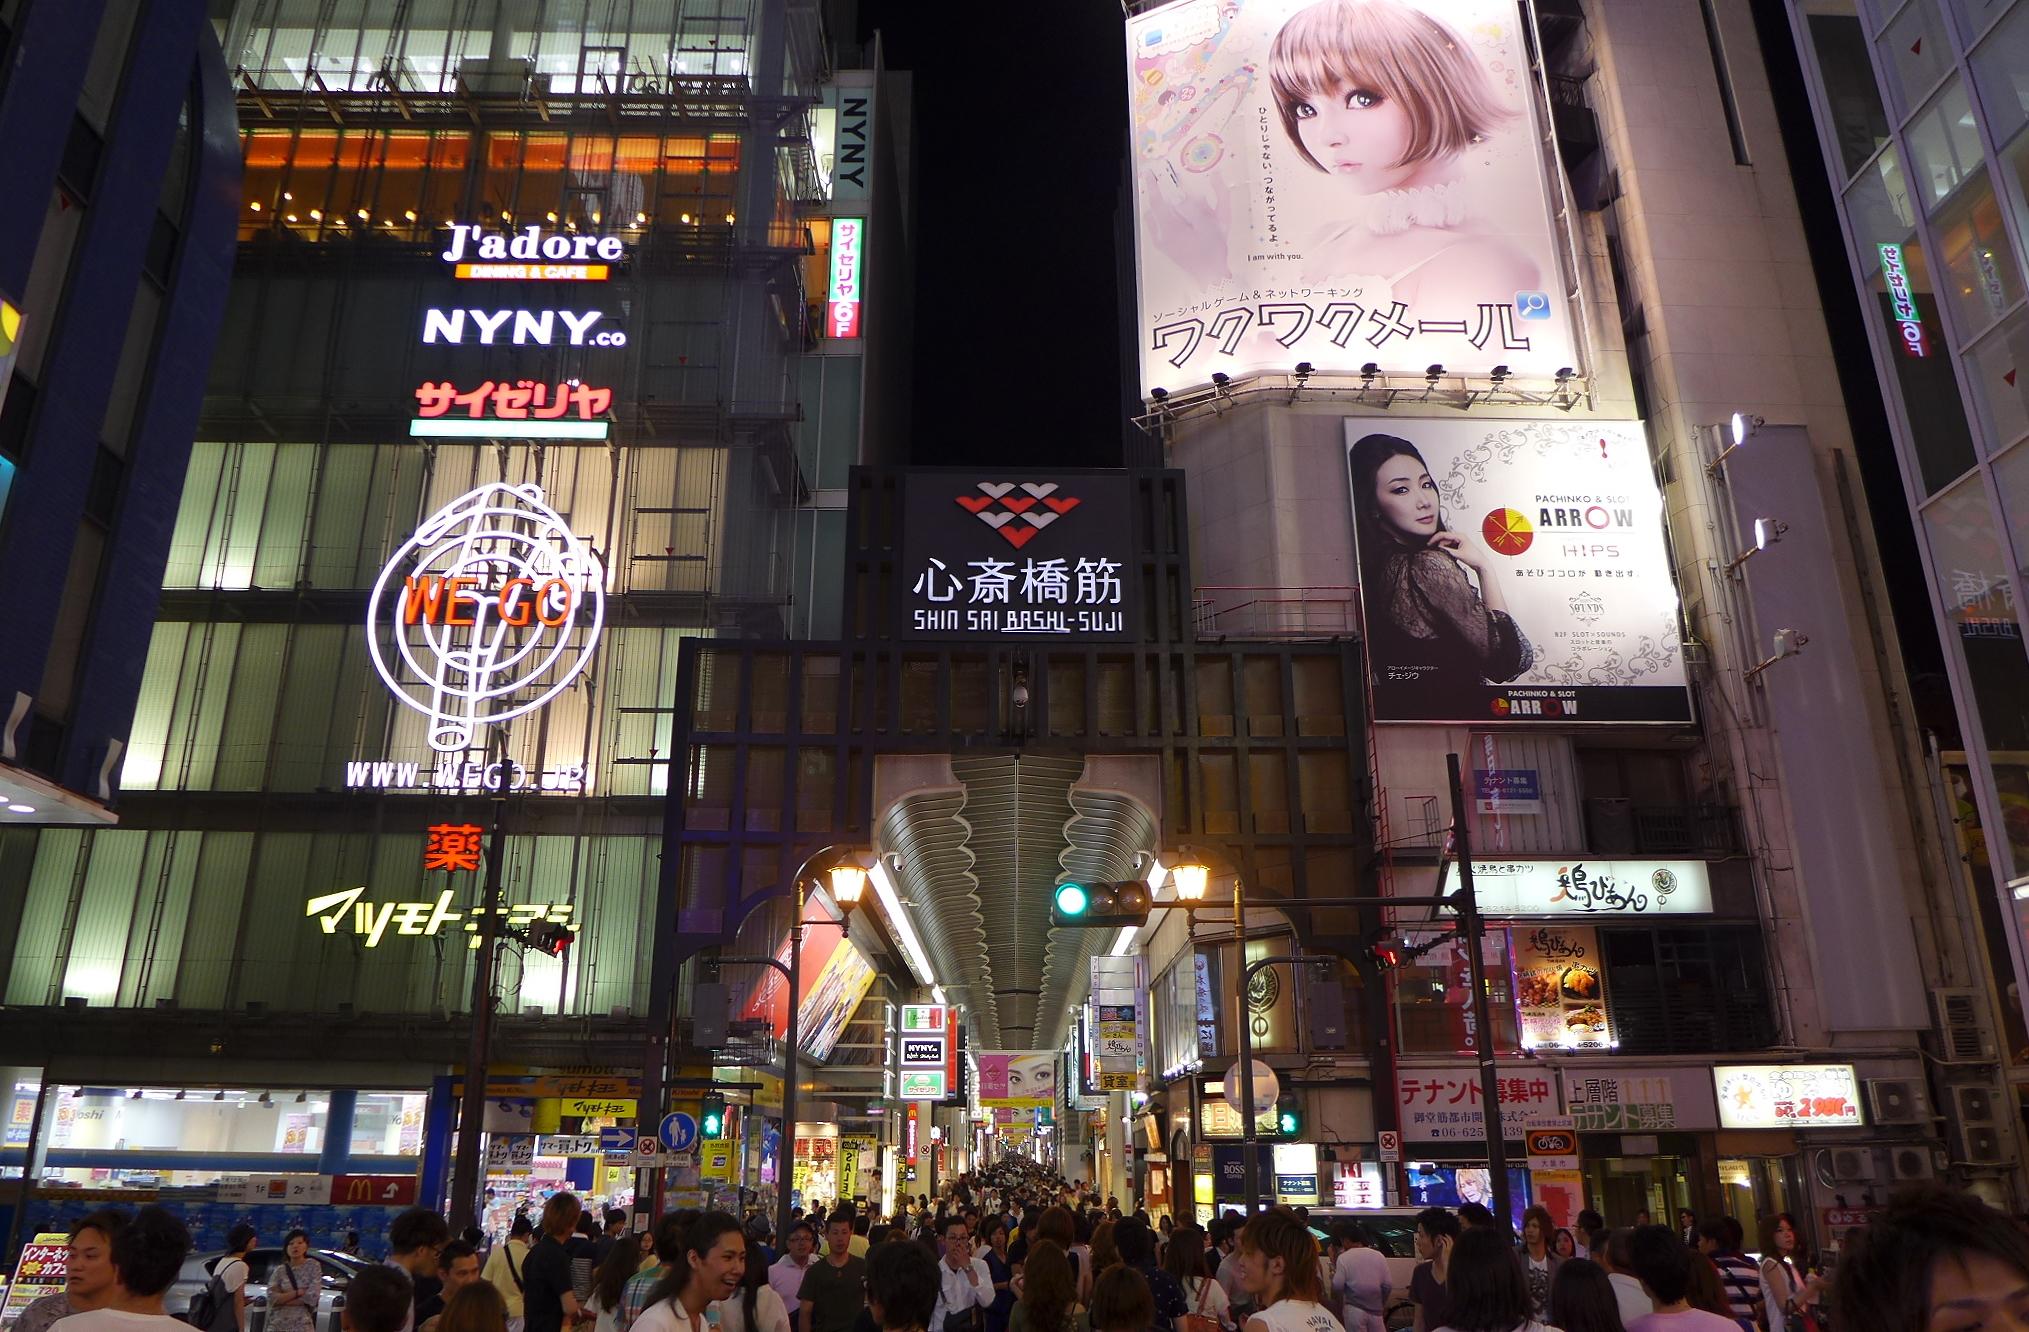 Shinsaibashisuji_Gate_Night_View_201407.jpg